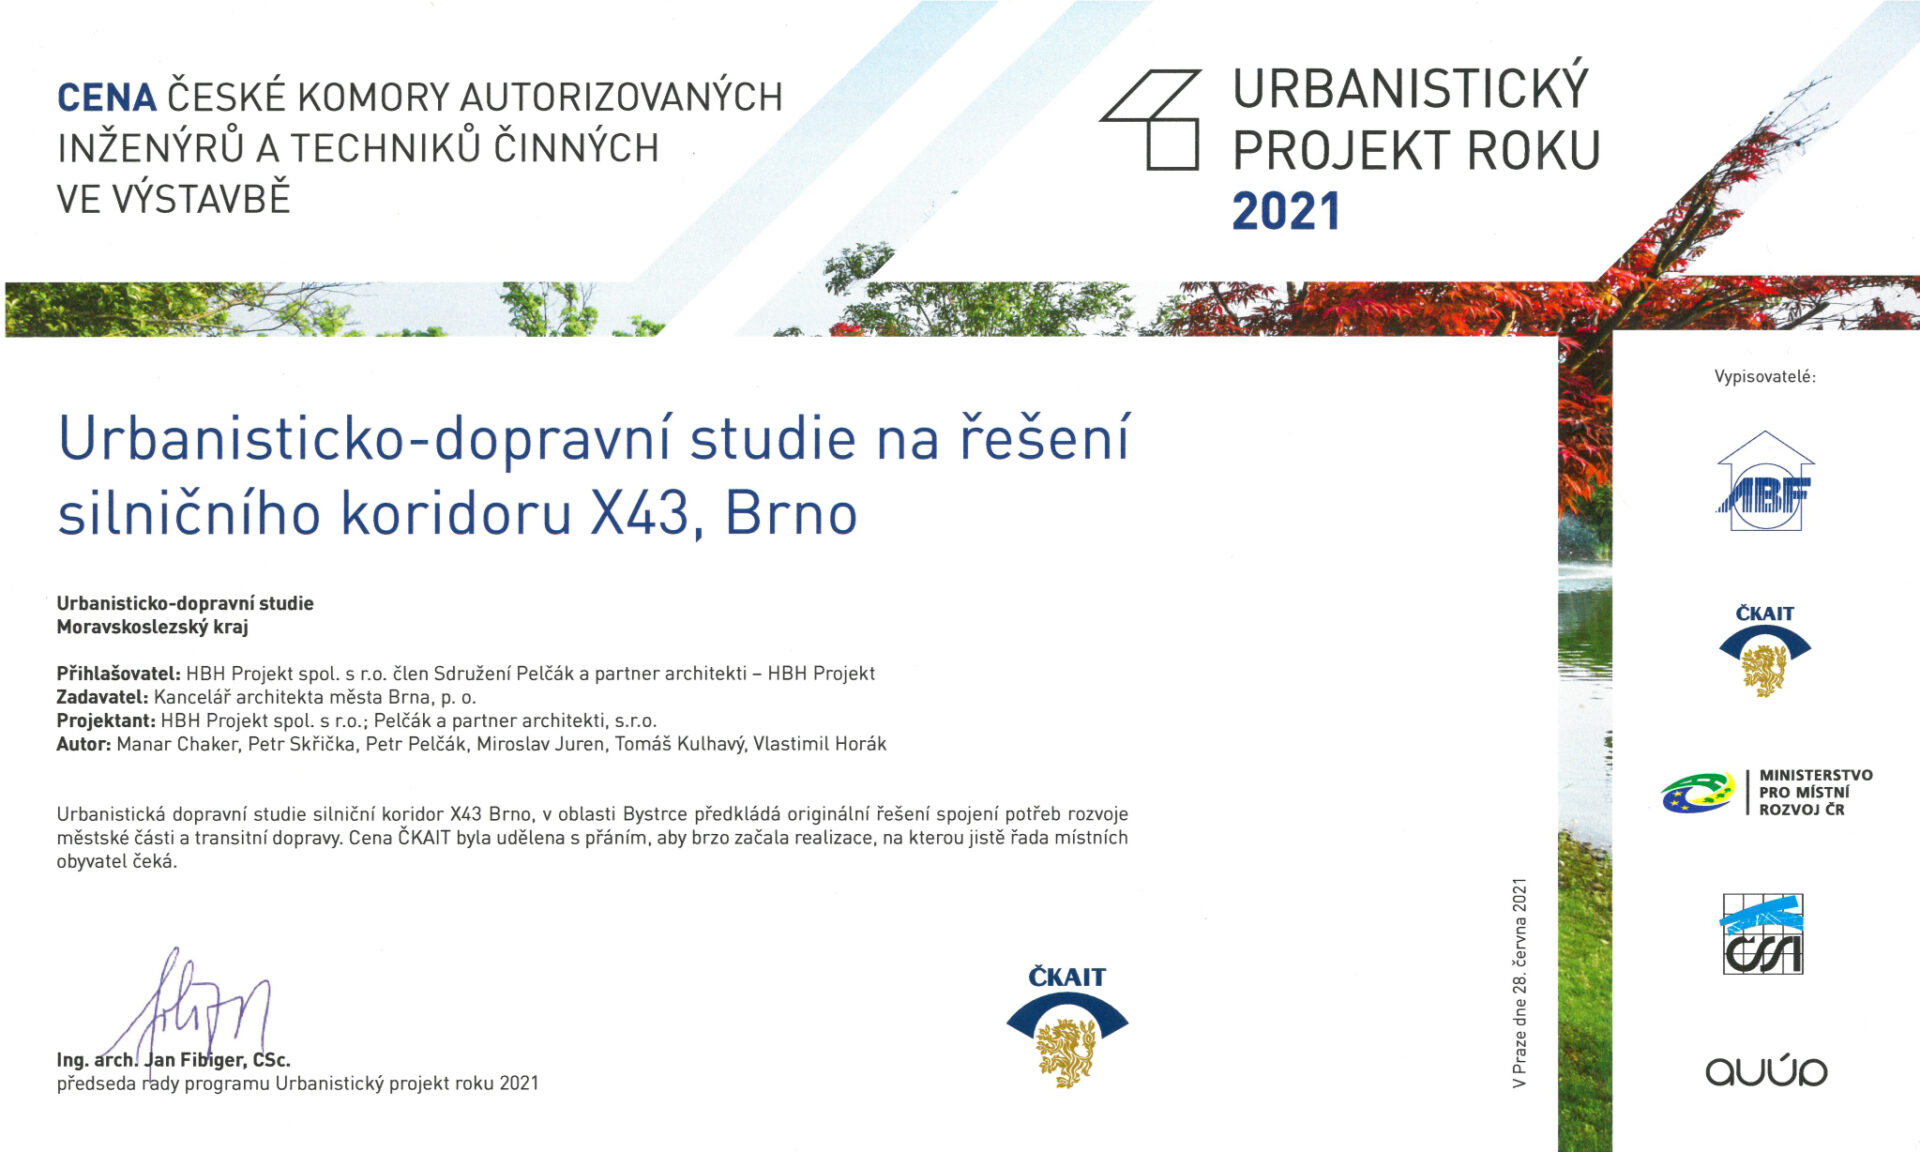 Silniční koridor X43 obdržel cenu – Urbanistický projekt roku 2021